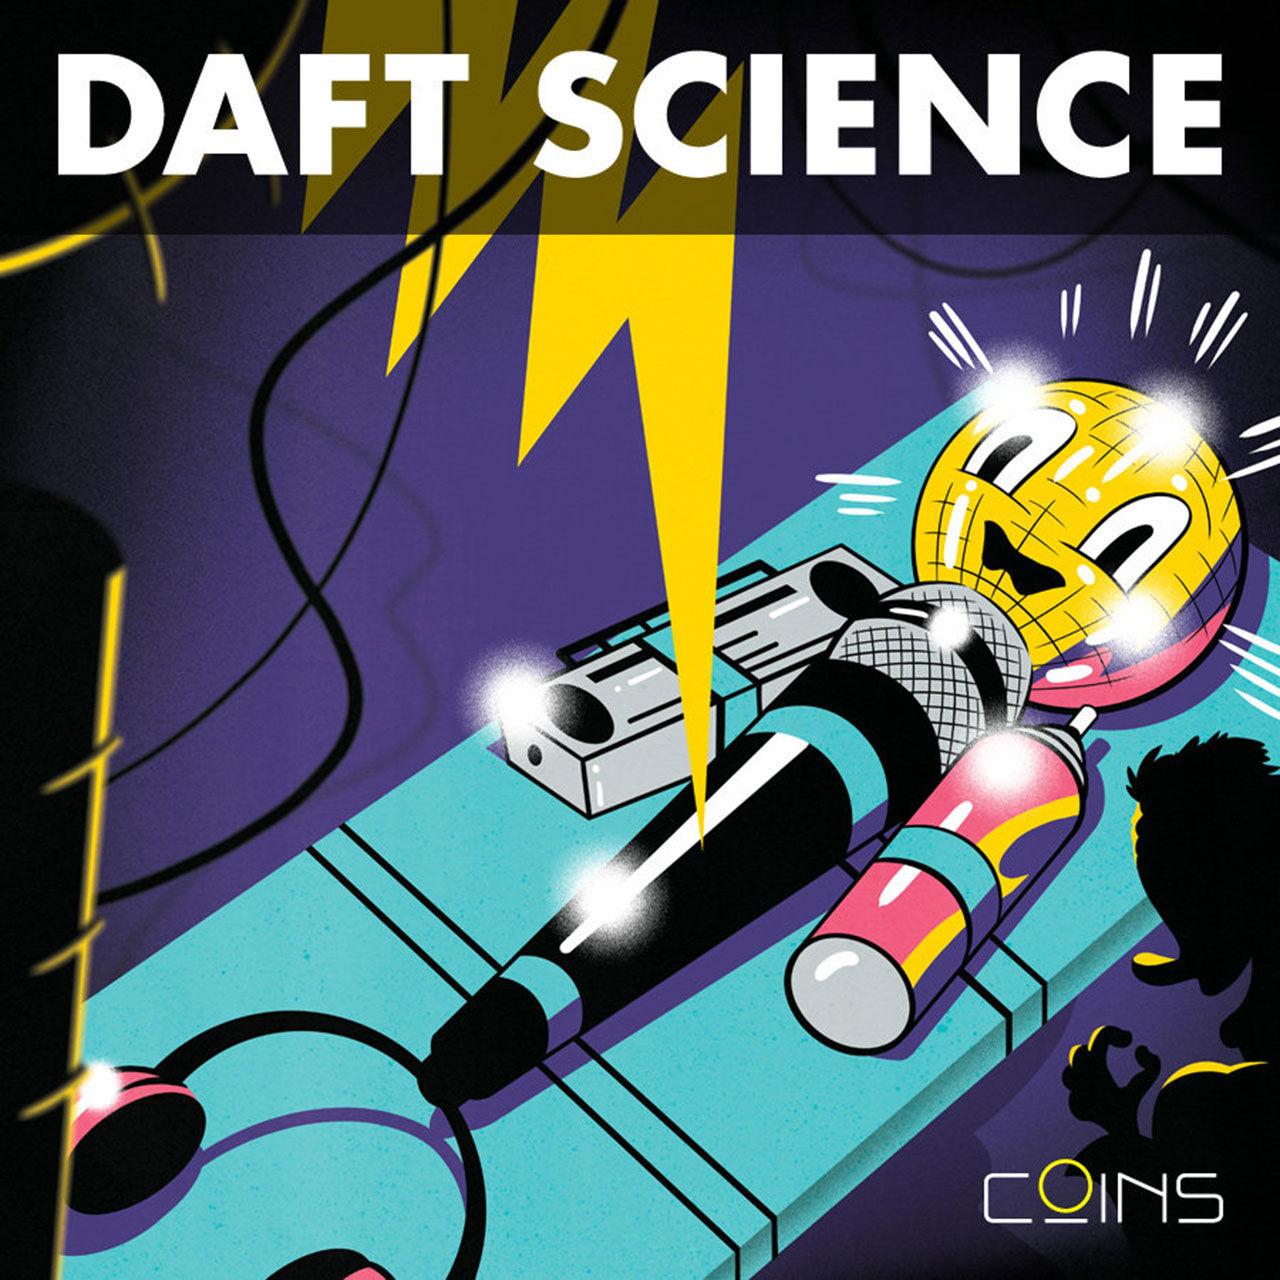 Remixade Beastie Boys med Daft Punk-samplingar